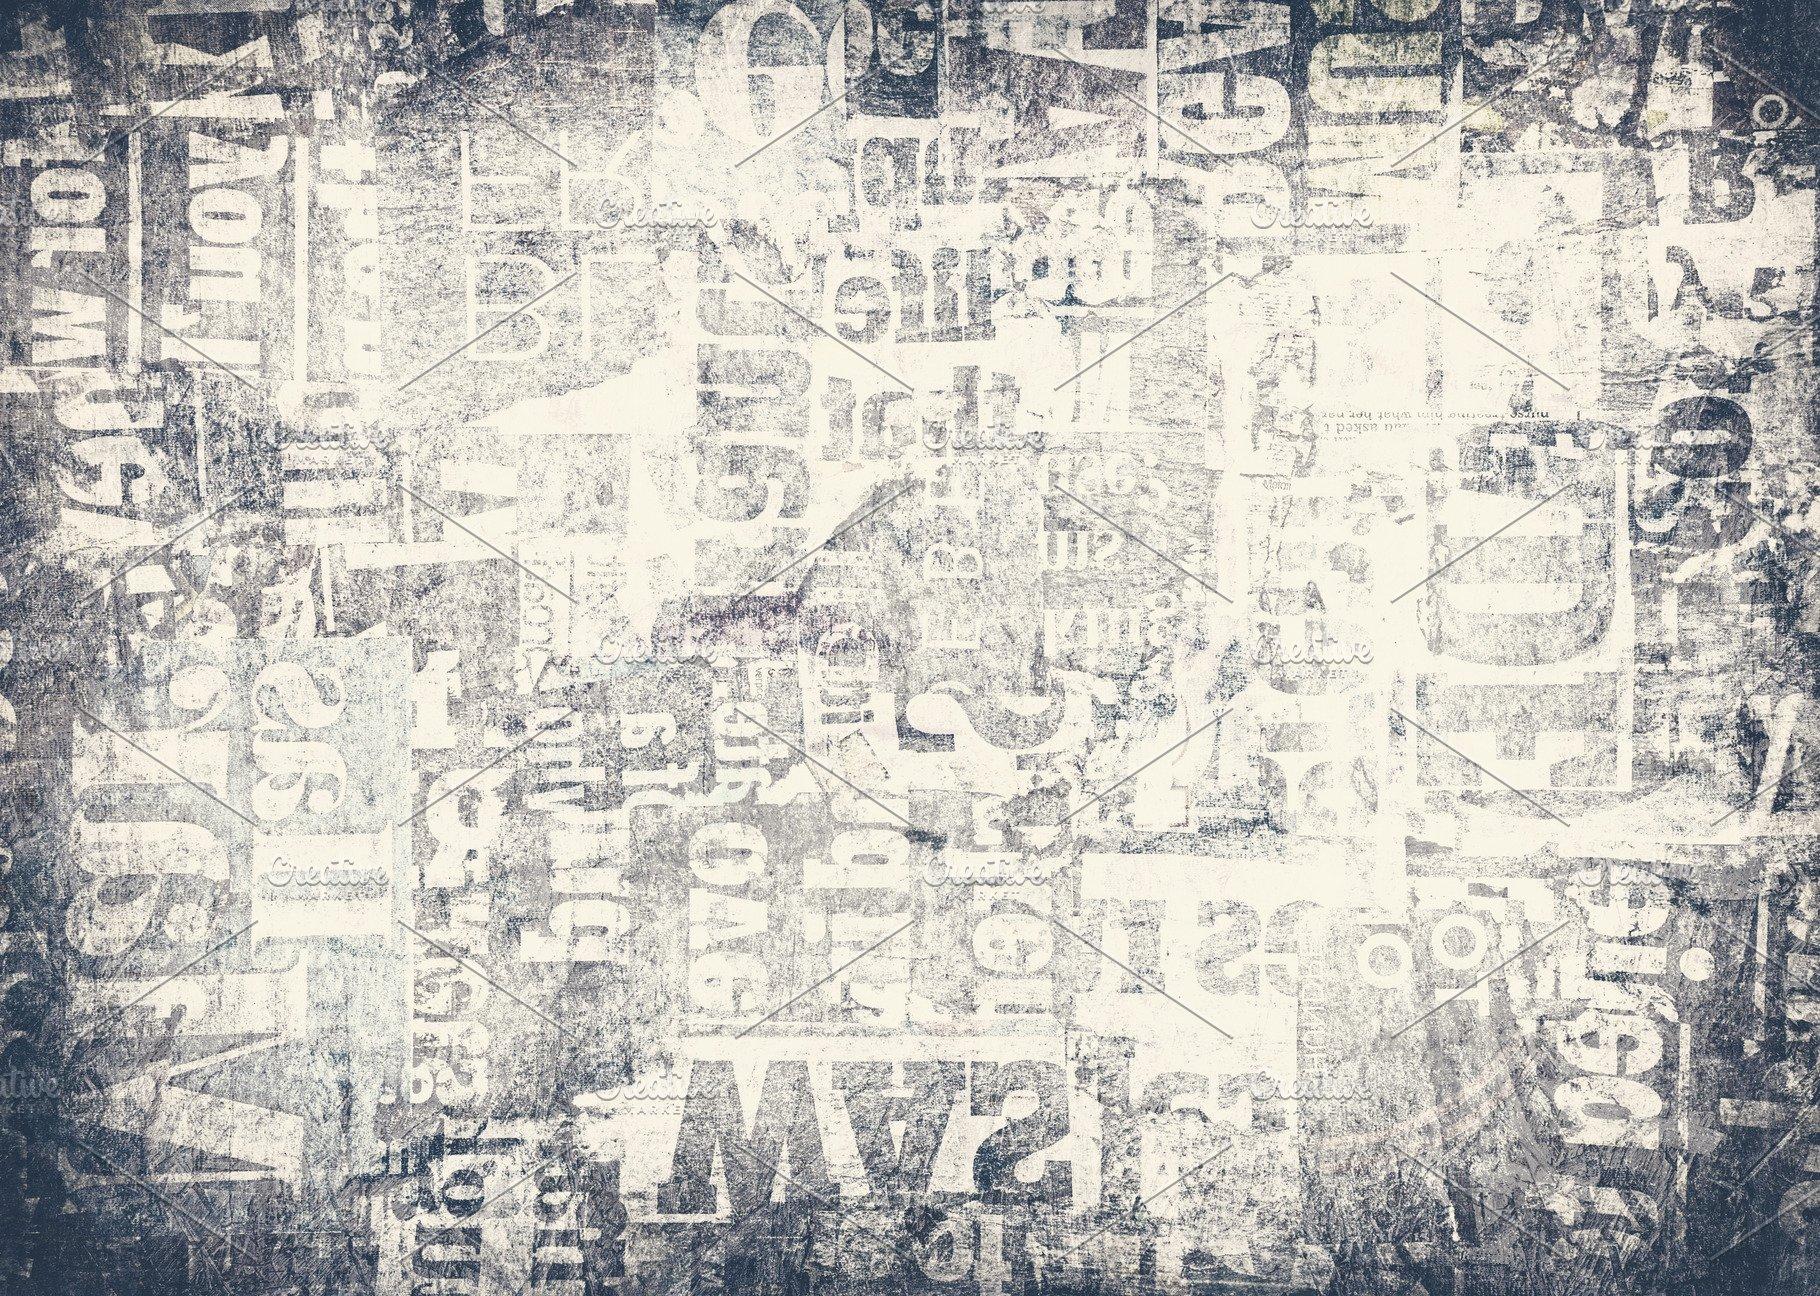 Grunge Newspaper Background Abstract Photos Creative Market 1820x1296